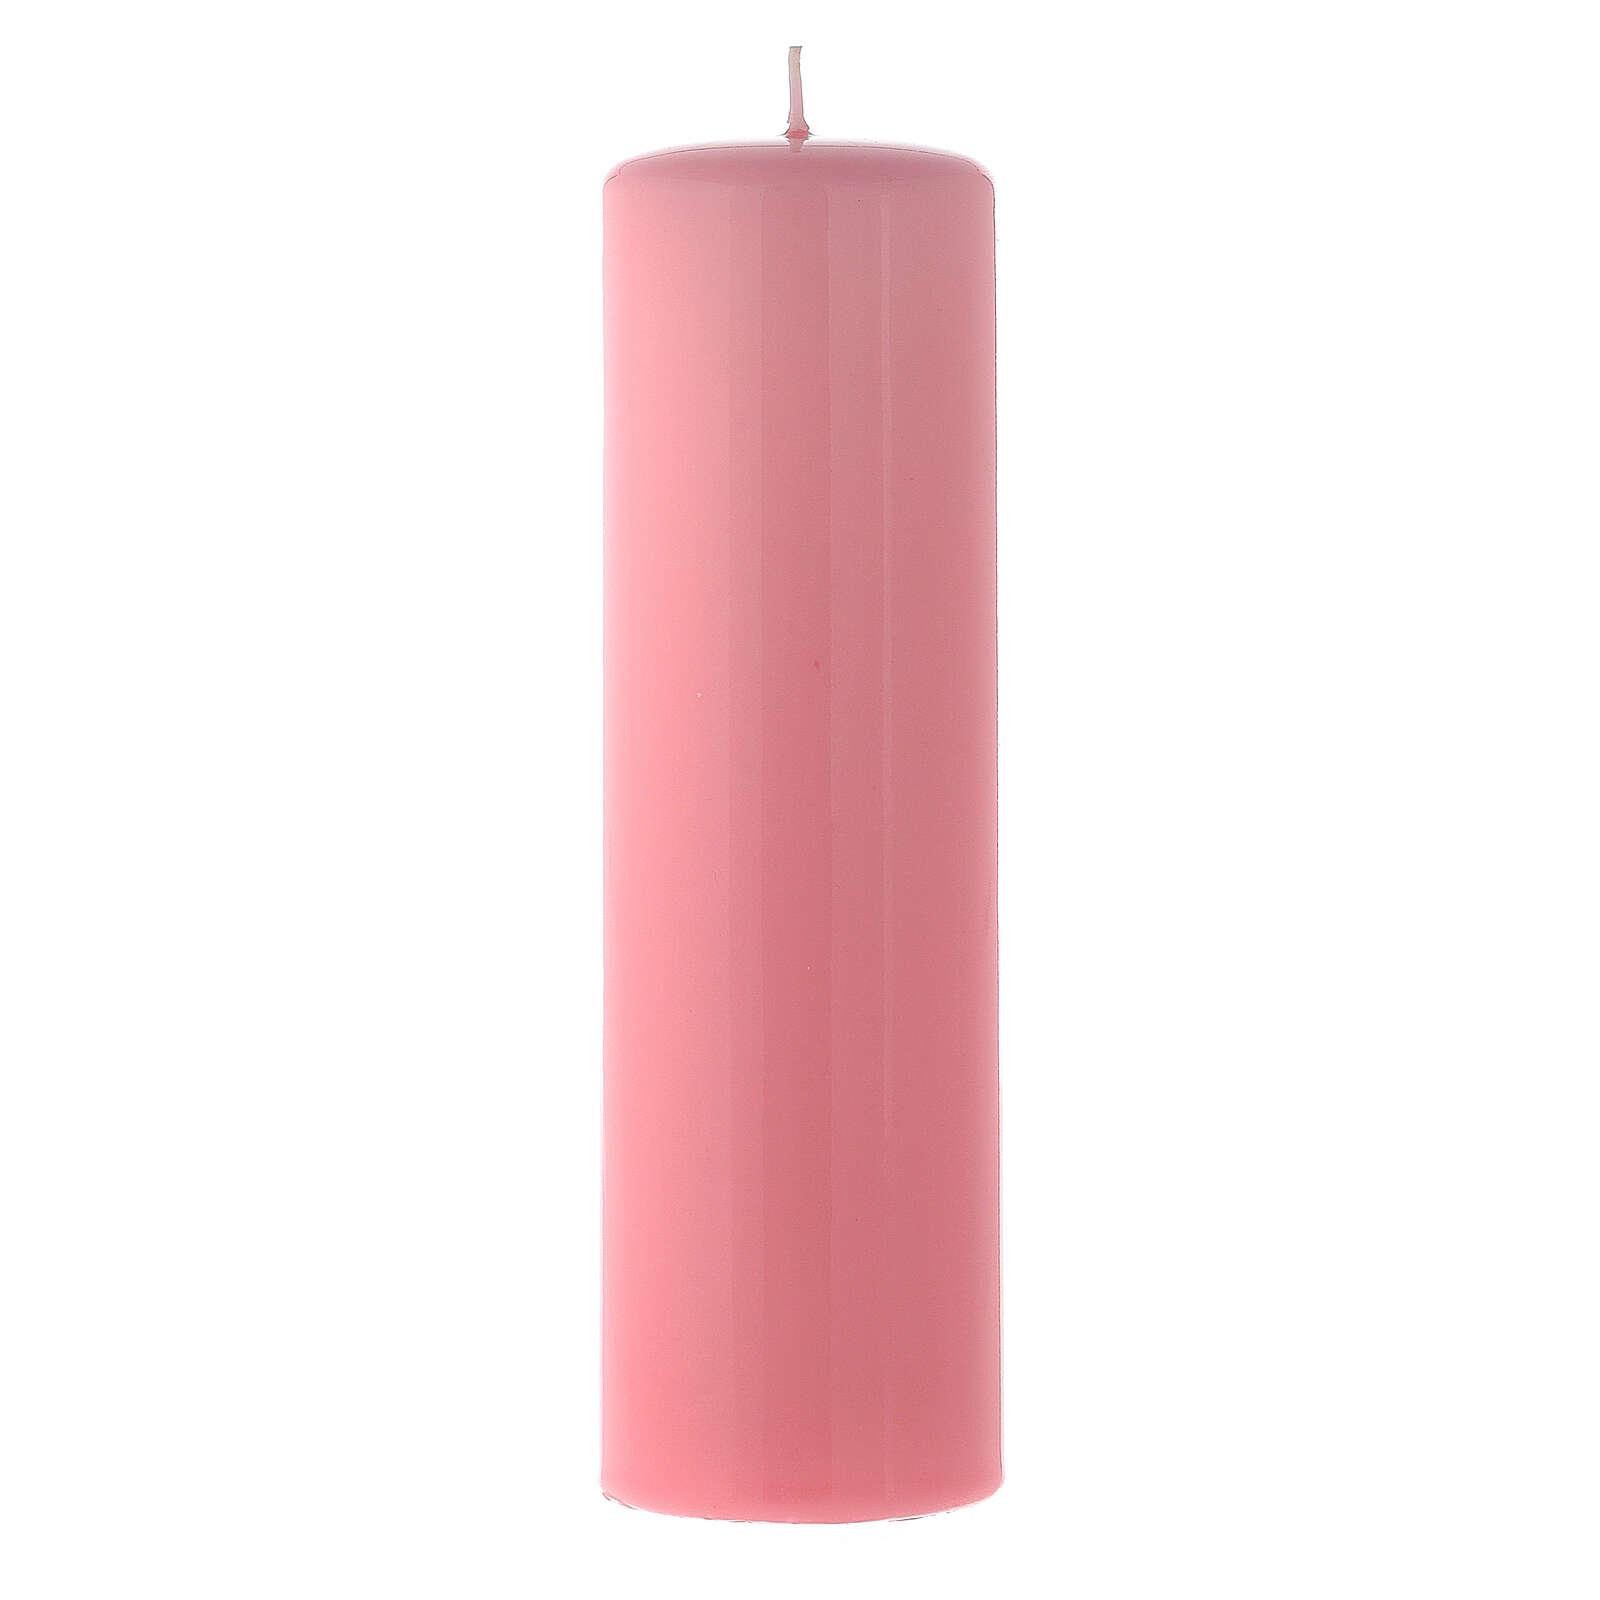 Advent candles 8x2 inc, 3 purple 1 rose 3